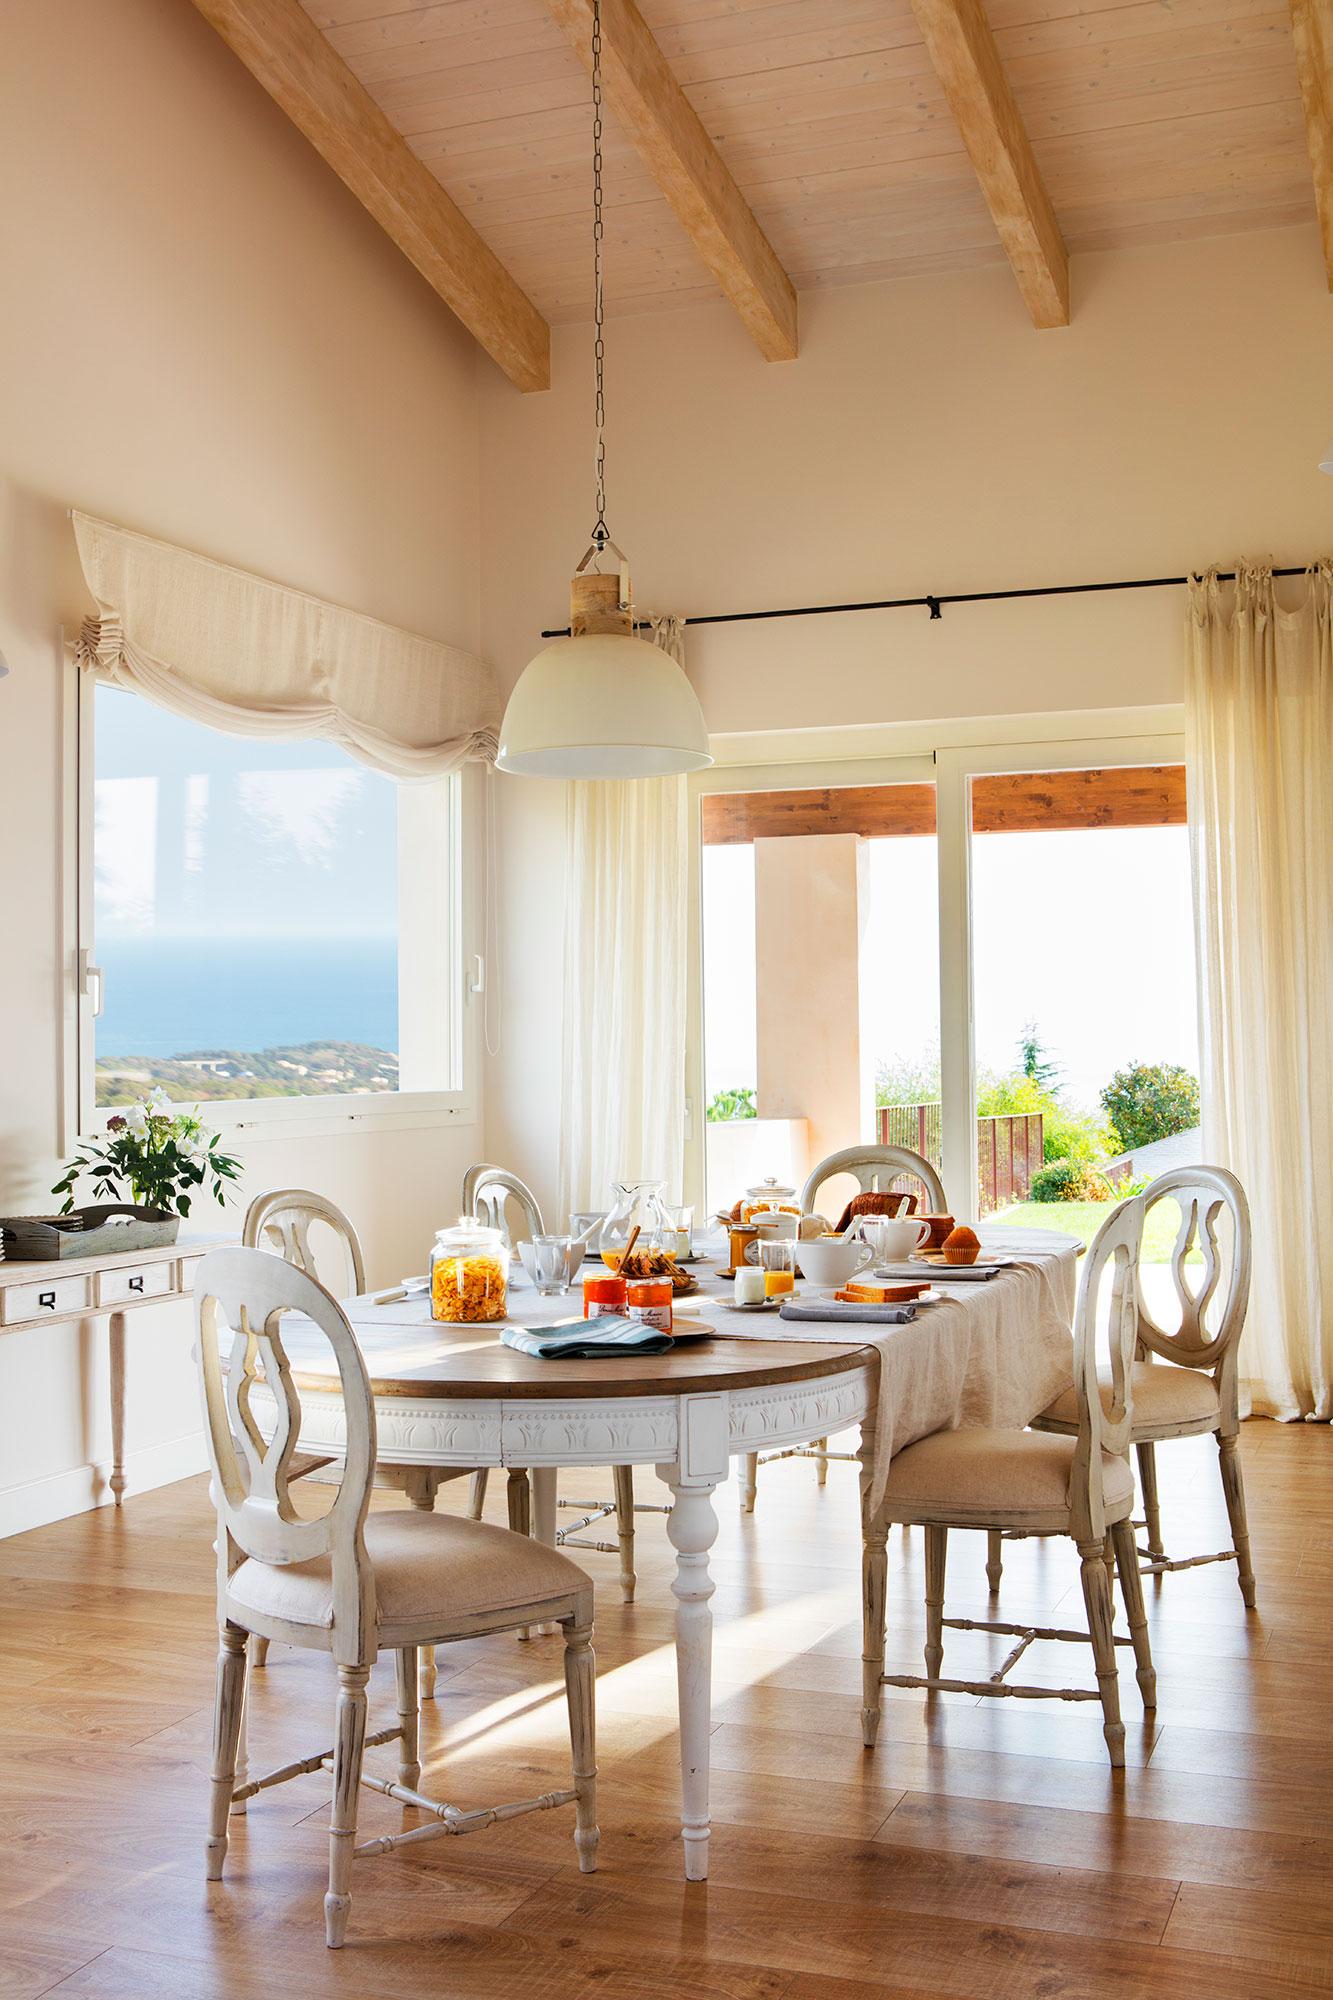 Mesas de comedor c mo elegir tu mesa de comedor perfecta for Mesa blanca y madera